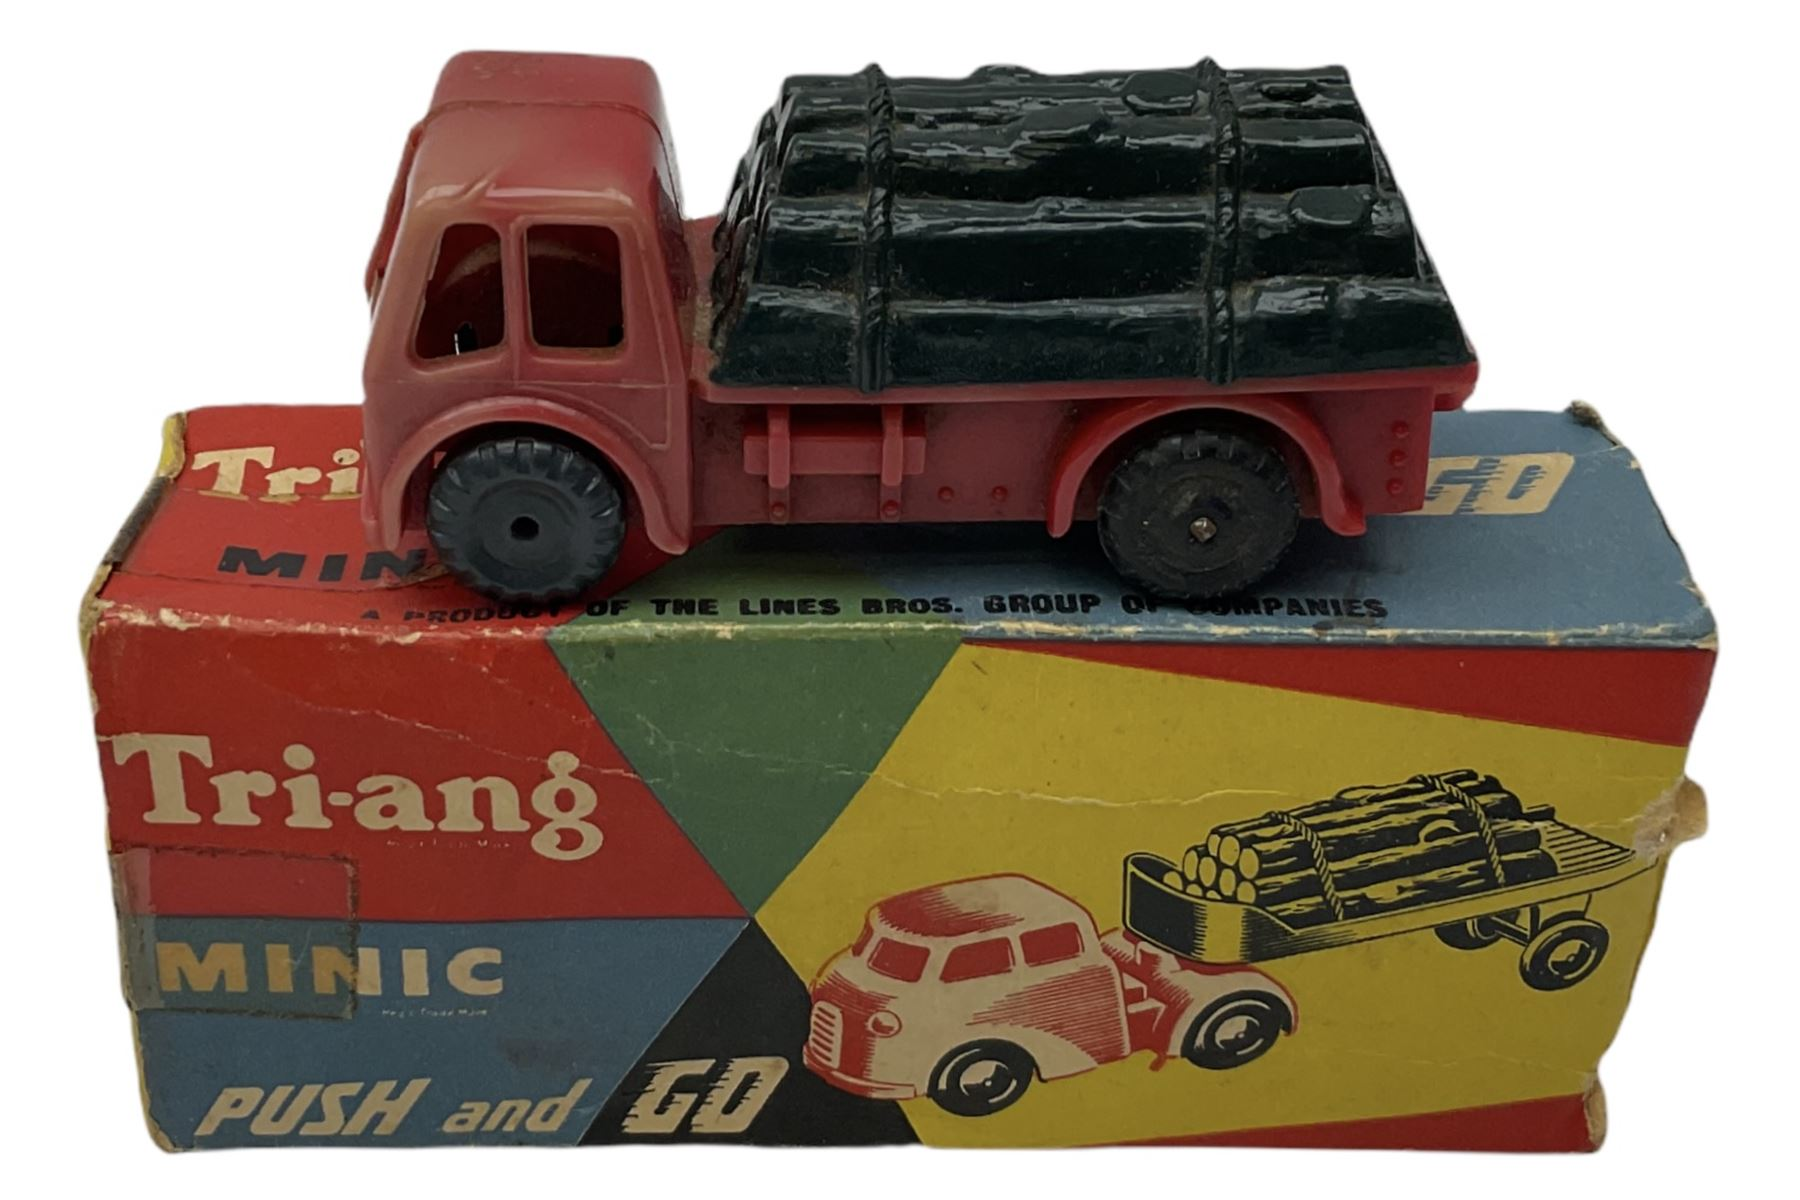 Tri-ang/Tri-ang Minic - twelve plastic friction-drive vehicles comprising Tri-ang Toys/Pedigree Pram - Image 4 of 7